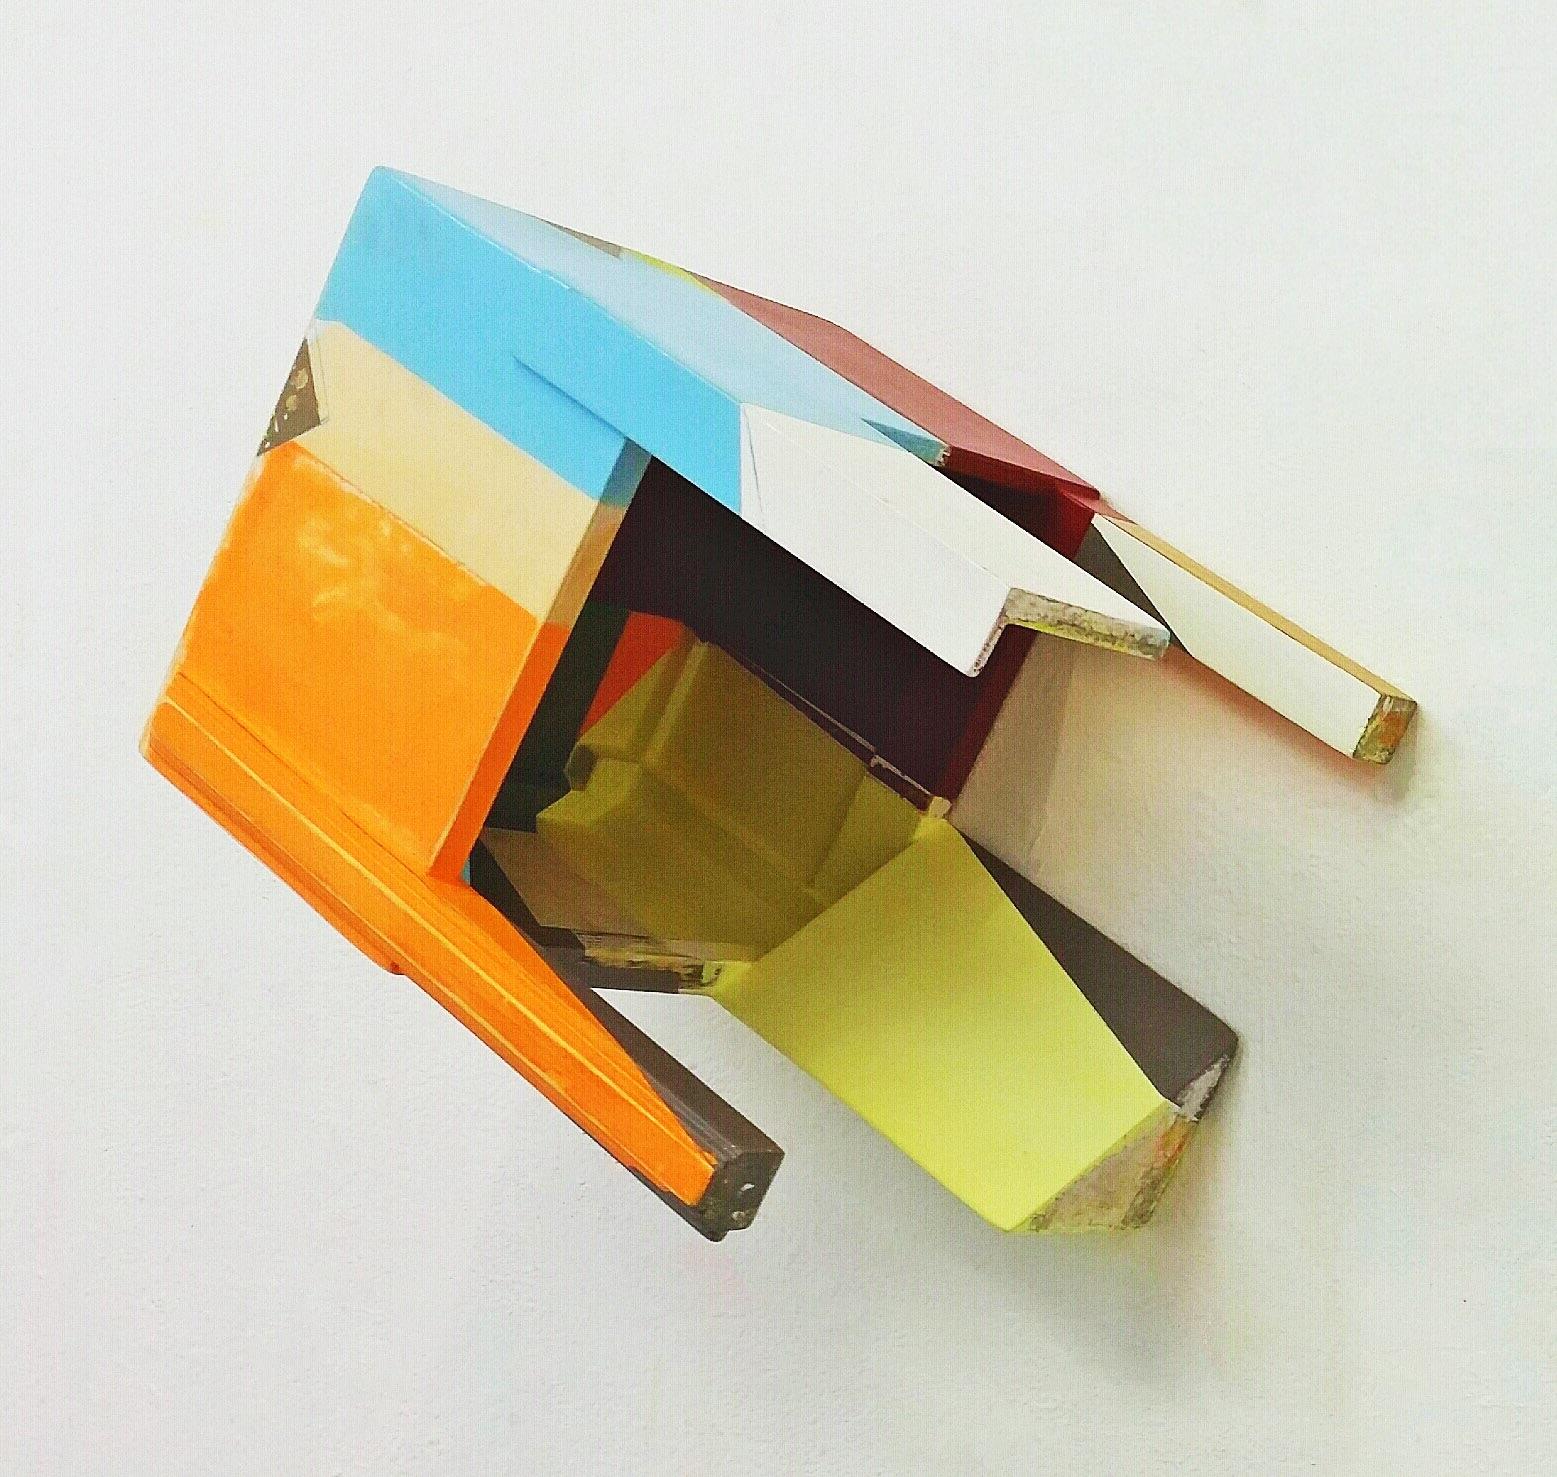 """Fliegt doch!"", 44x31x33 cm, Acrylfarbe, Holz, 2017"